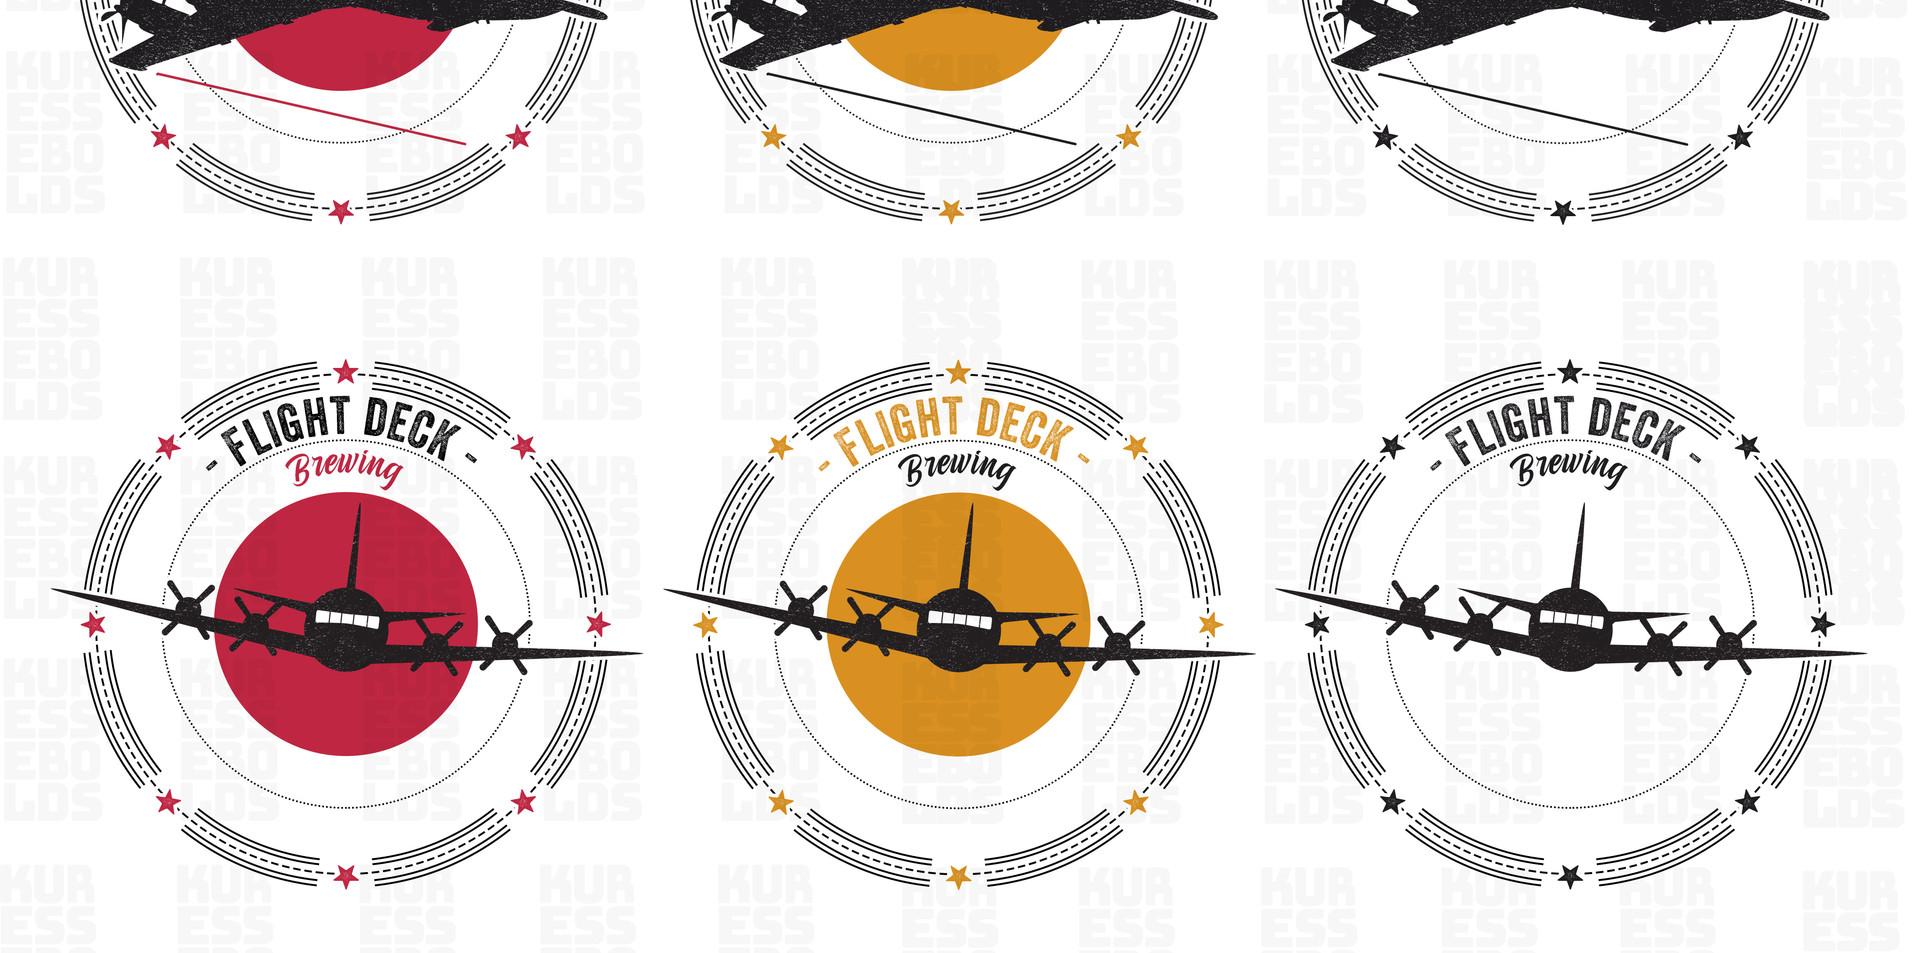 Flight Deck Brewing test logo - 1